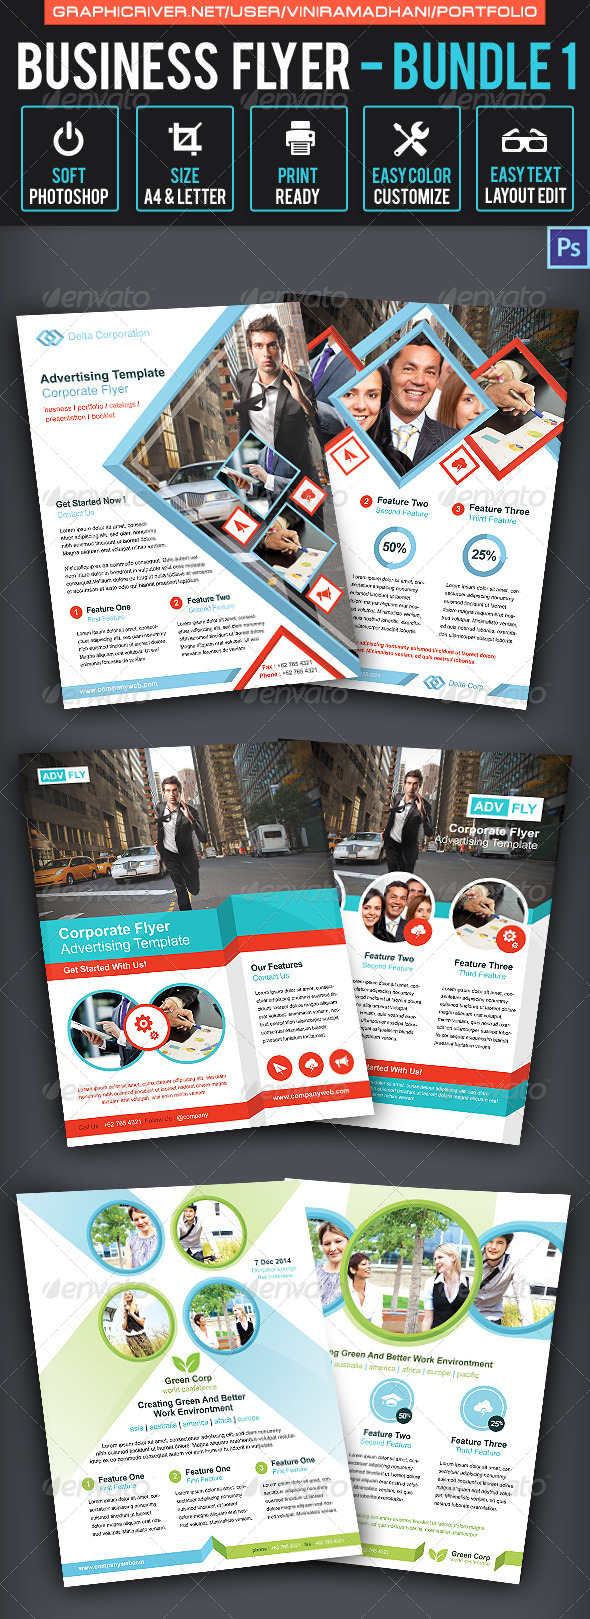 Business Flyer Bundle 1 - Corporate Flyers